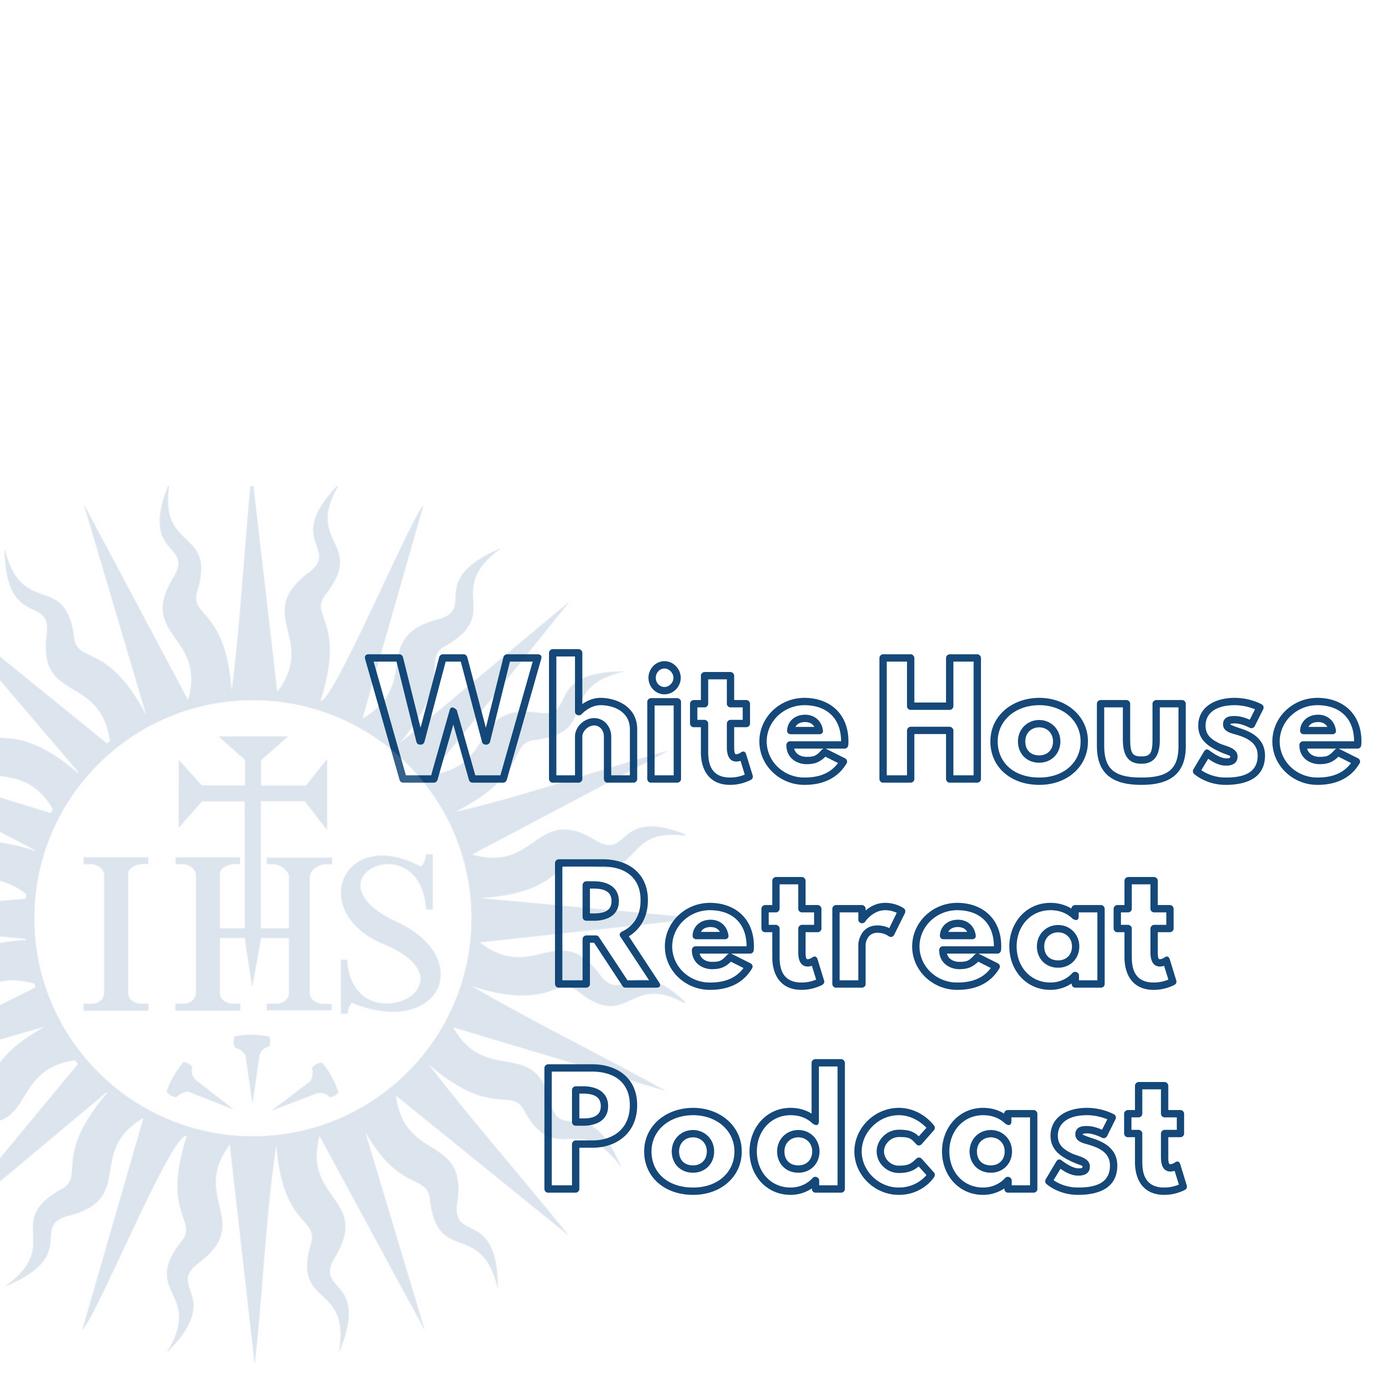 White House Retreat Podcast show art